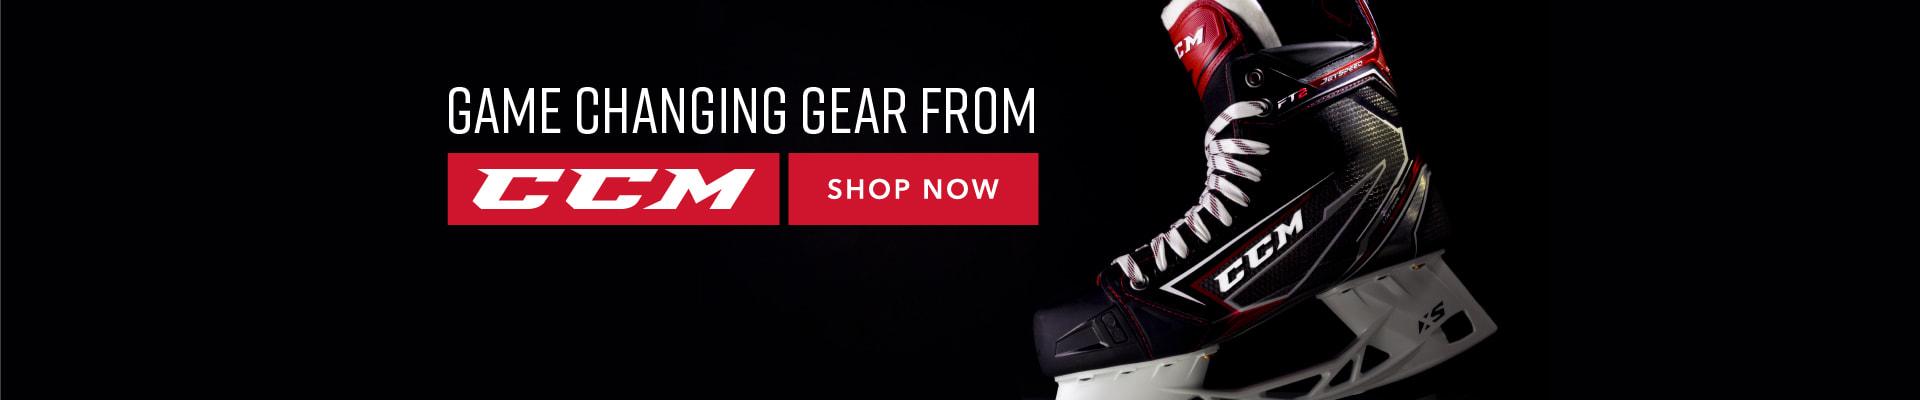 Hockey Equipment Hockey Gear Sticks Skates Gloves Accessories